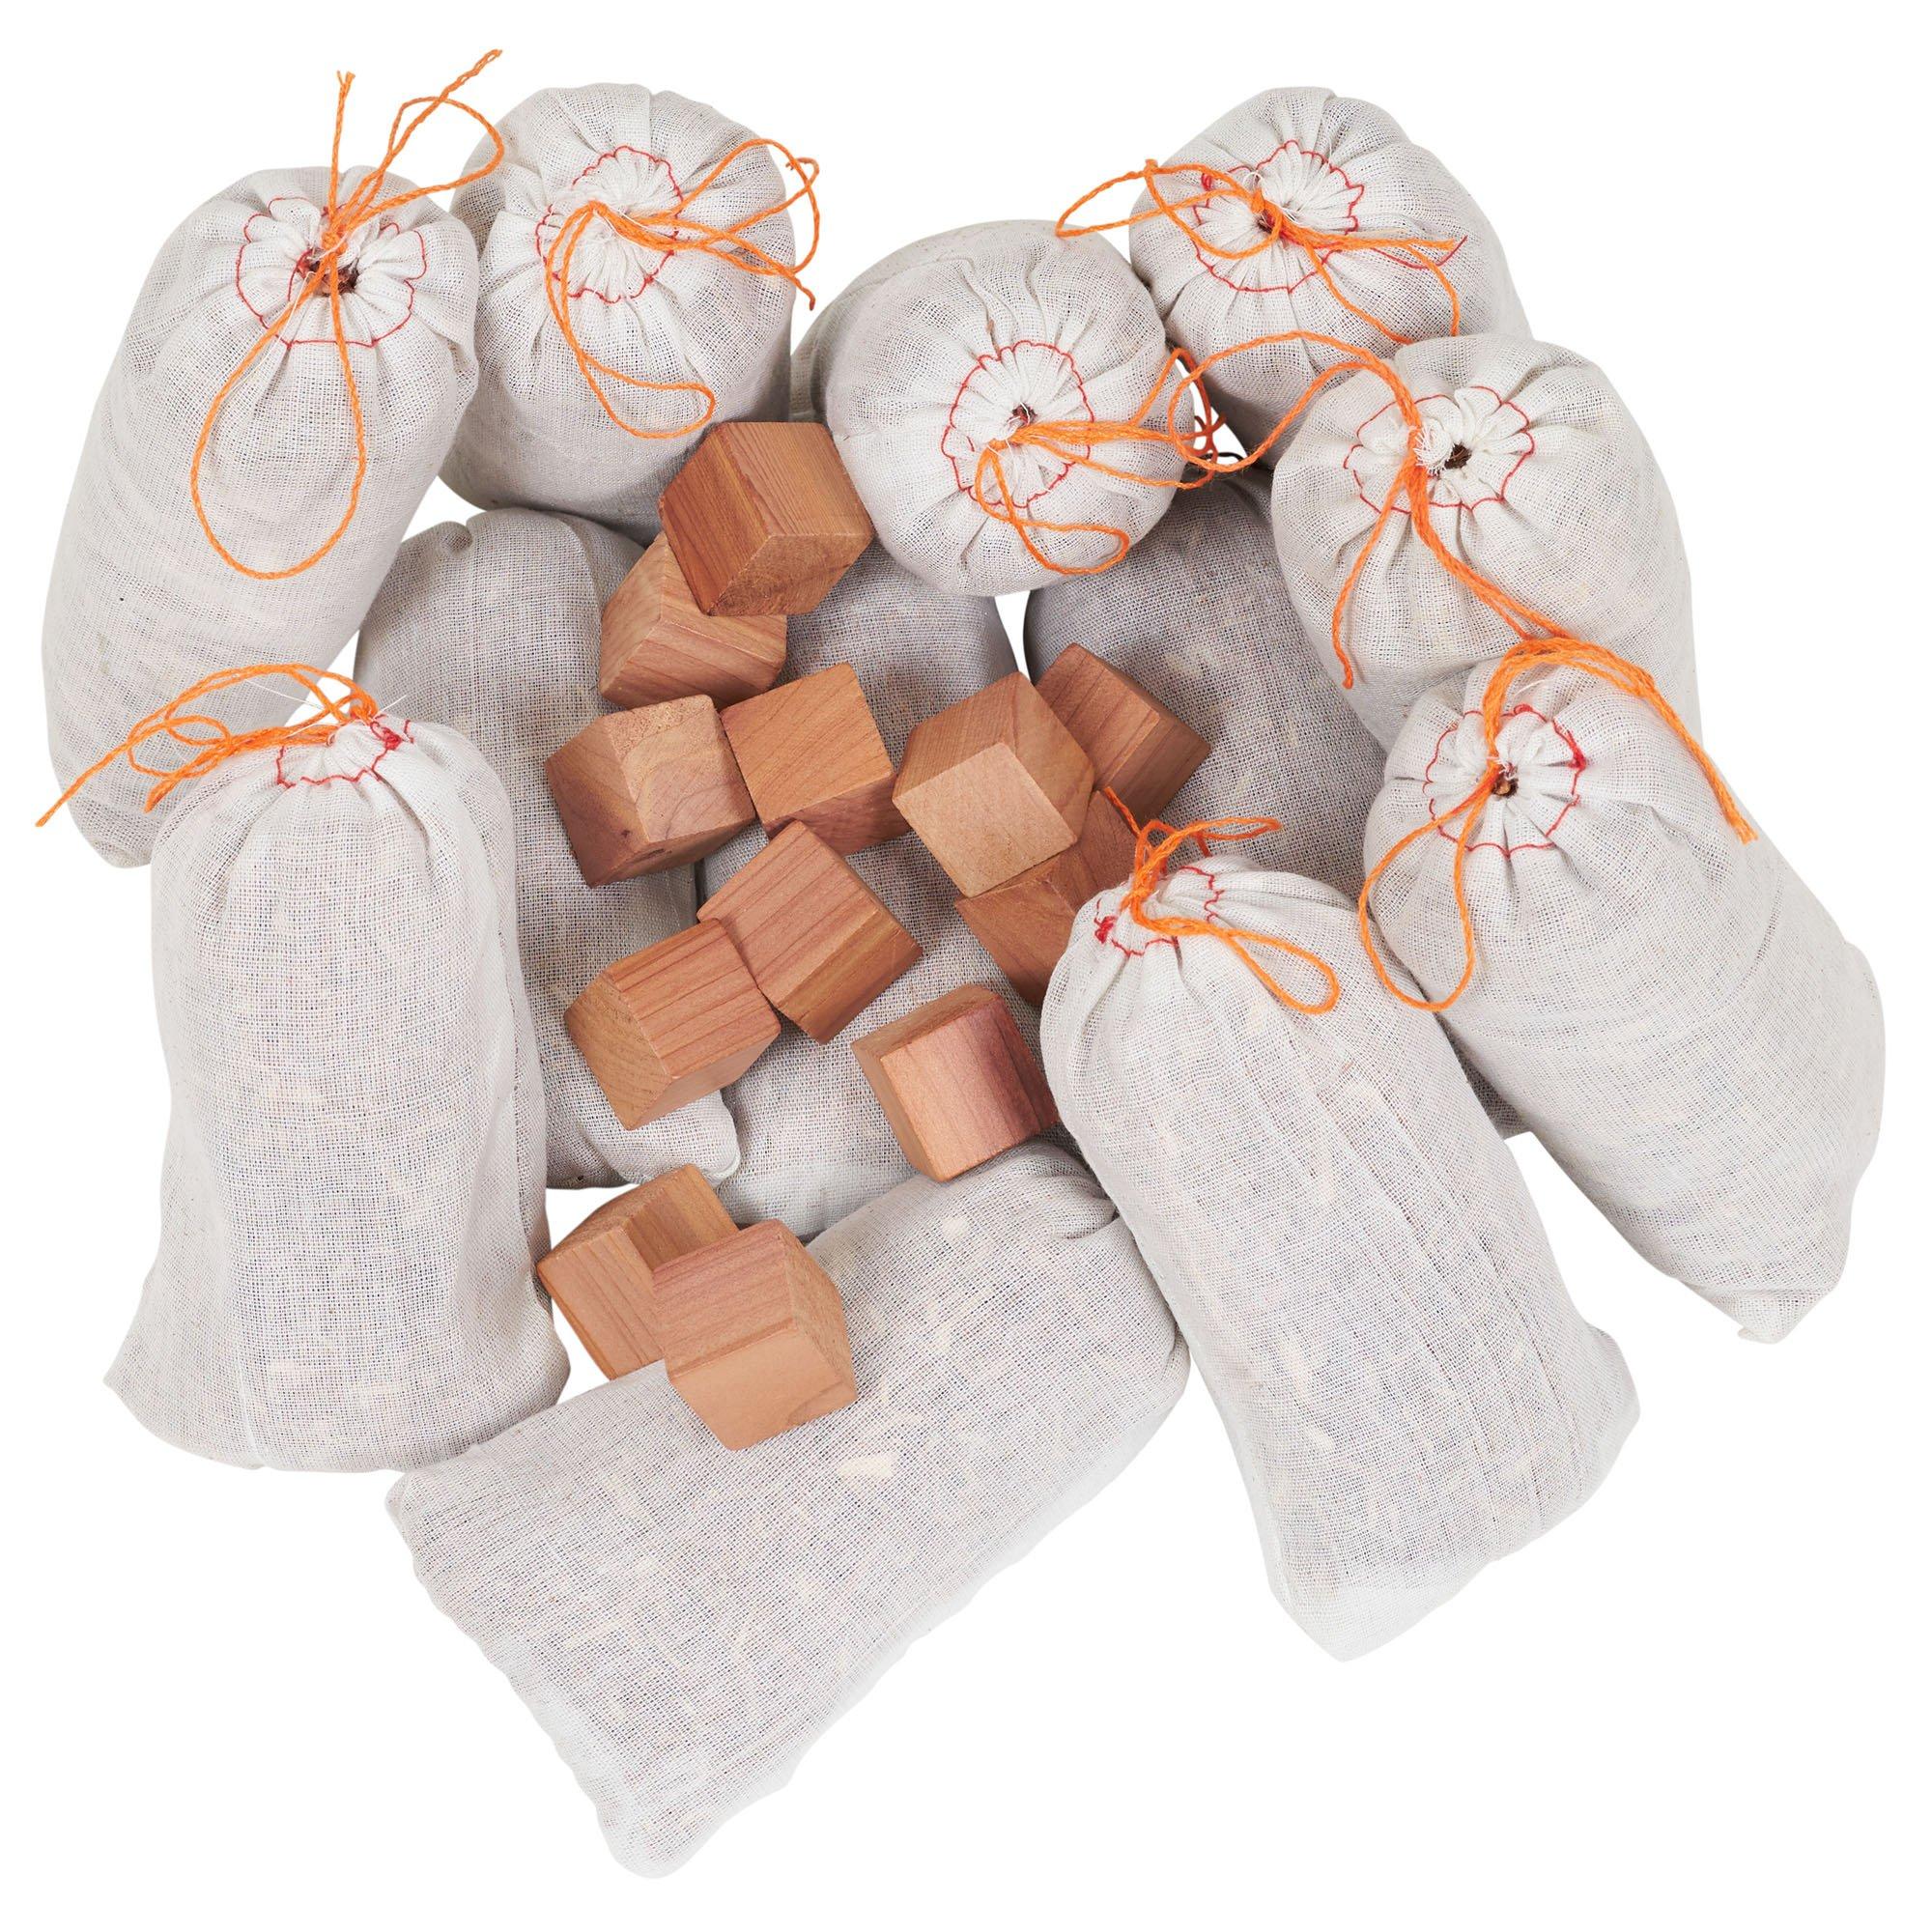 Household Essentials 35779-1 Cedar Wood Value Sachet Set, 12 Cedar Blocks and 12 Cedar Sachets, White